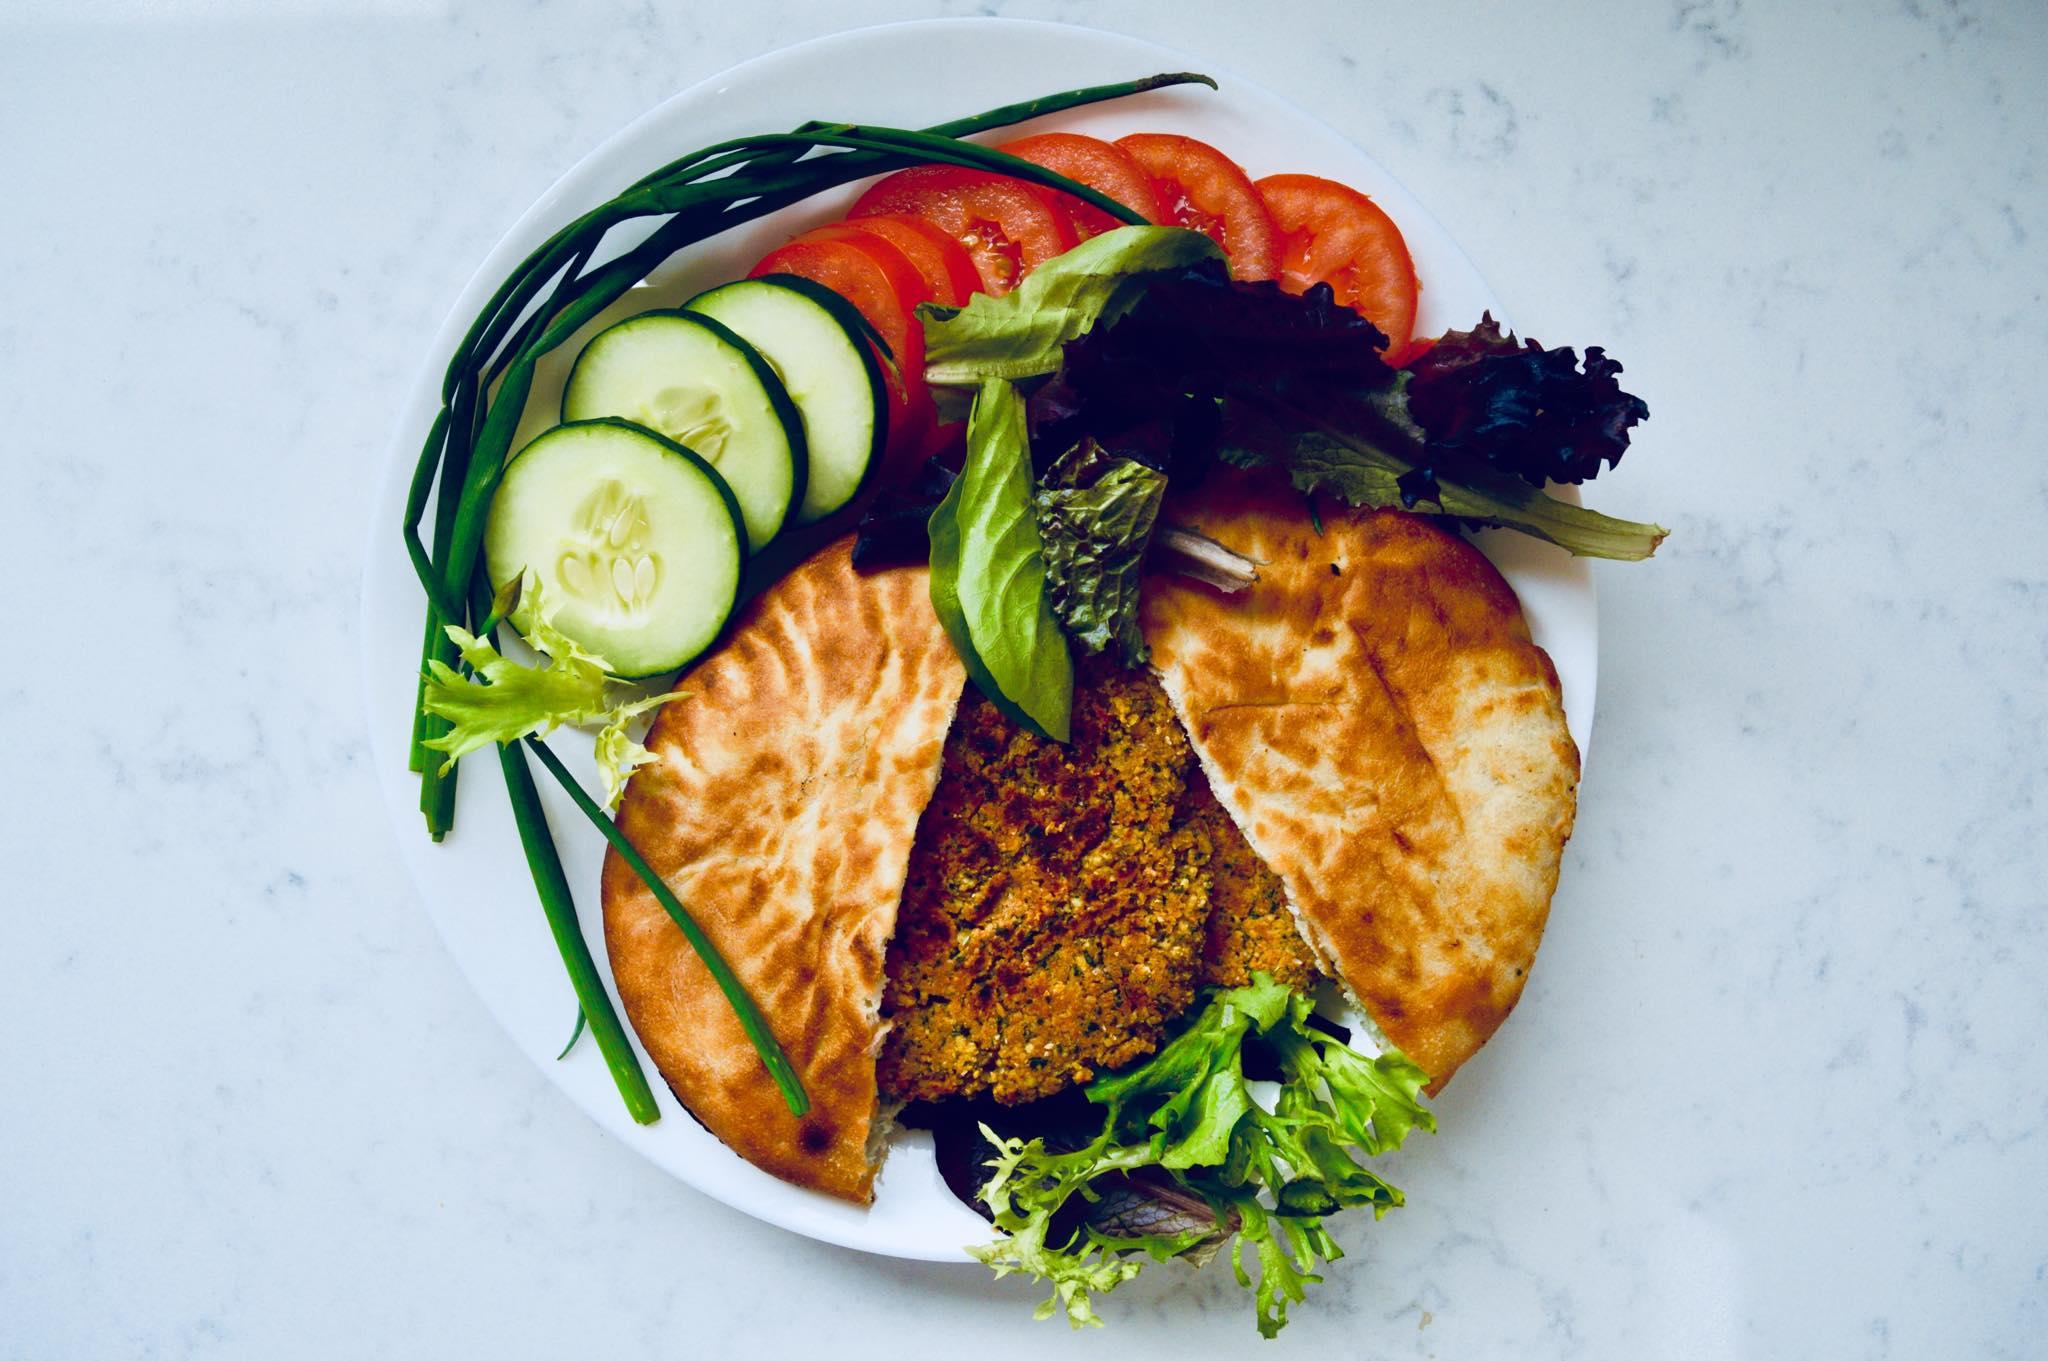 falafel, plant based, vegan, vegetarian, clean eating, protein, fiber, healthy, homemade, modern homestead, radical self care